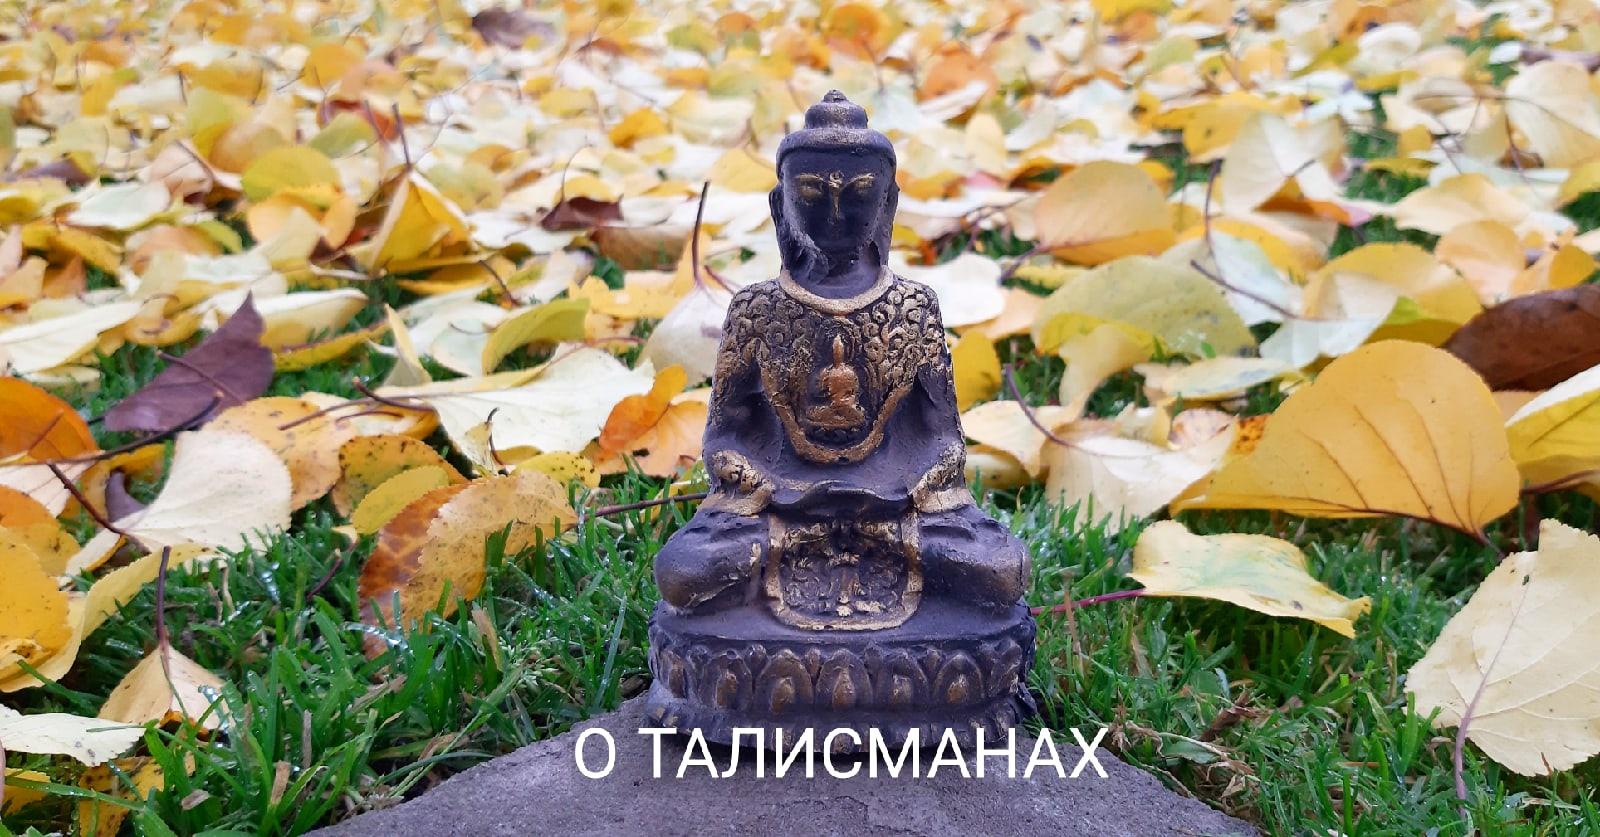 Украина - Натуальные камни. Талисманы, амулеты из натуральных камней - Страница 3 LRqpVi0bk6w